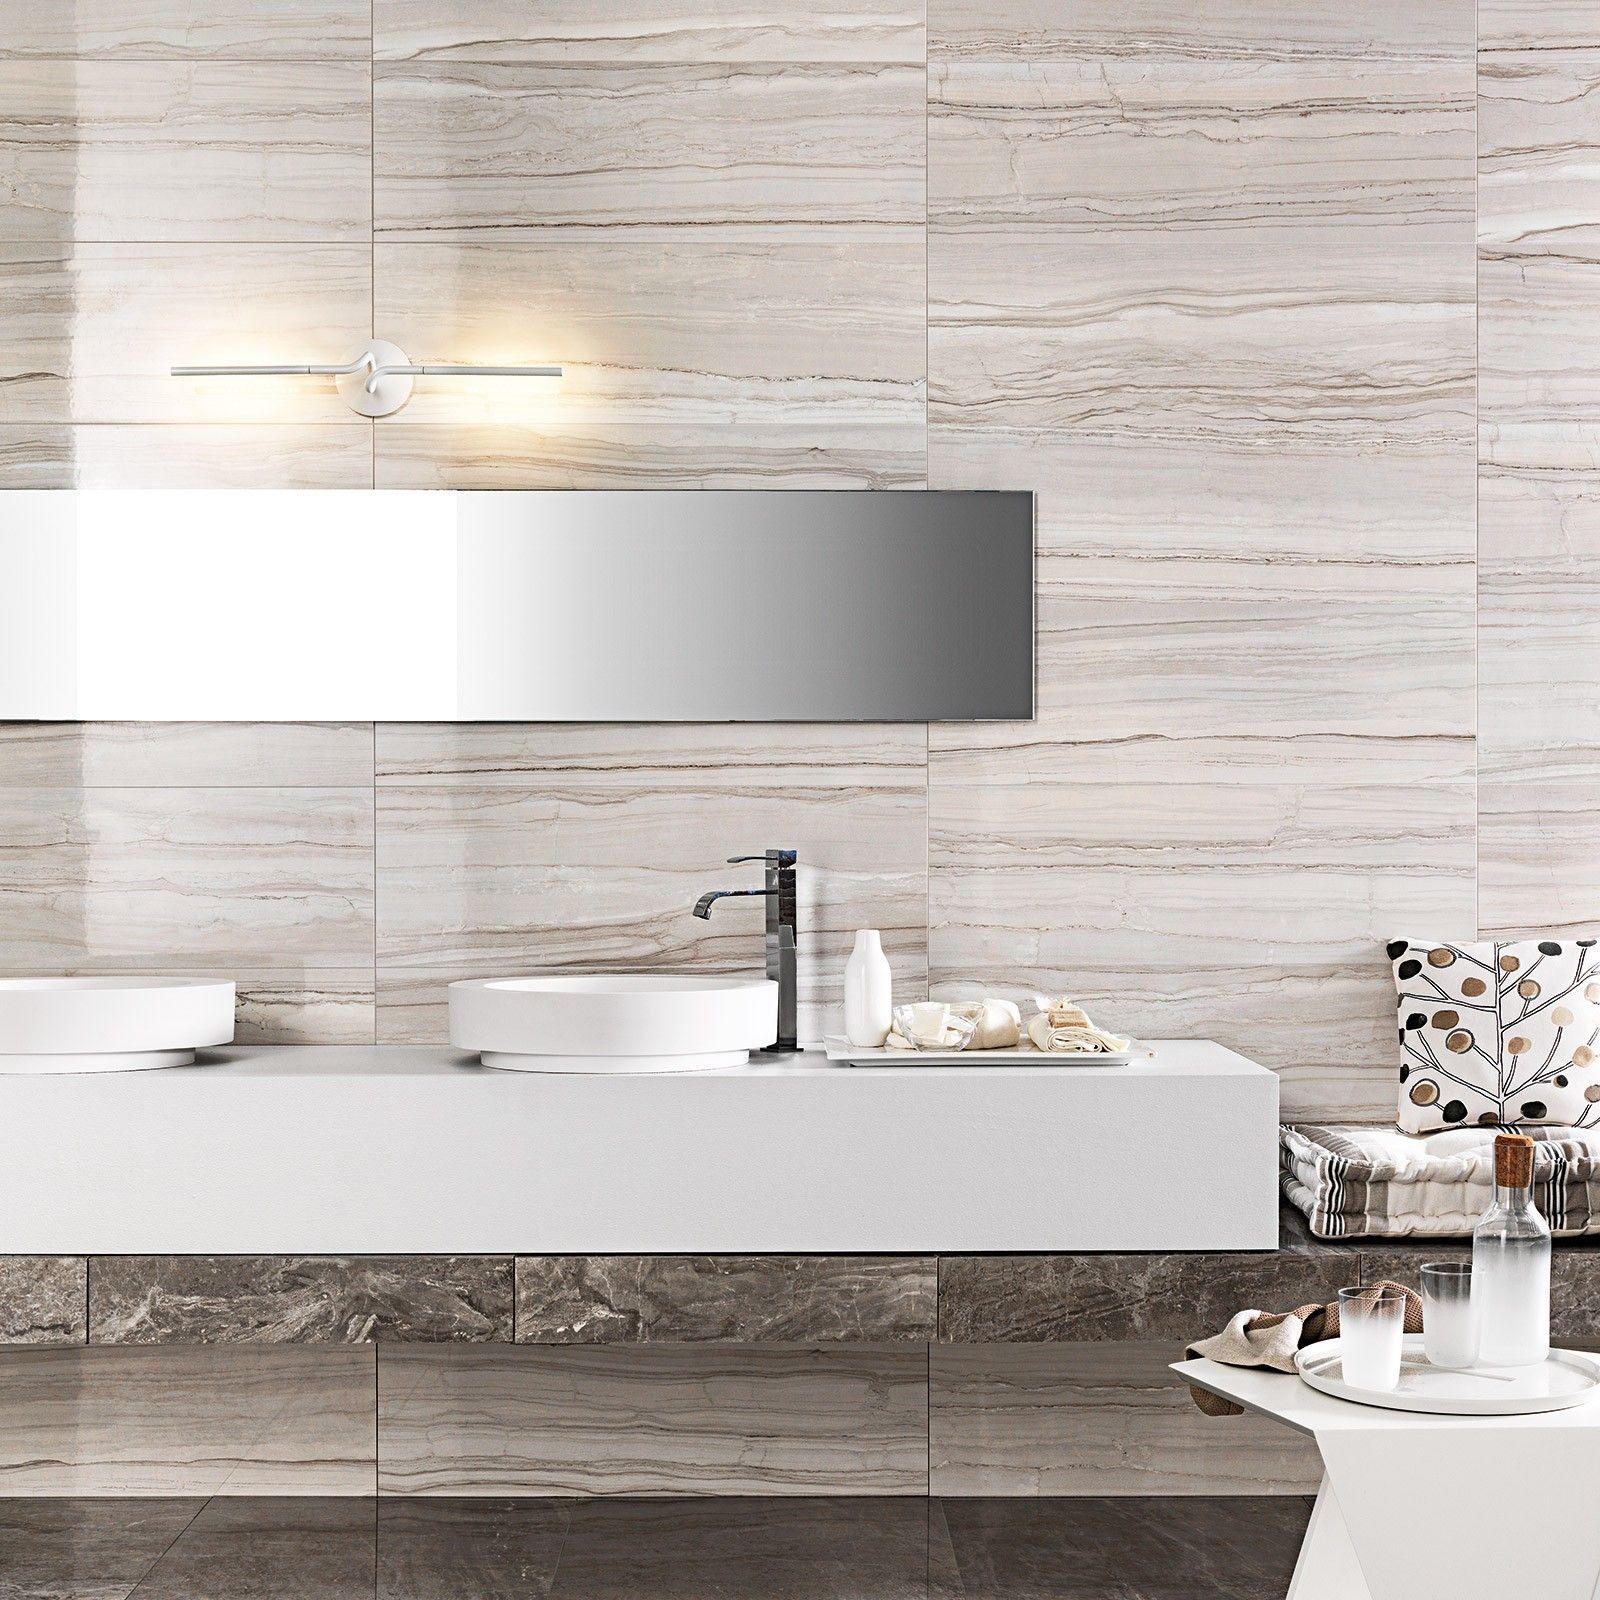 marmi elegance striato rectified wall tile black and. Black Bedroom Furniture Sets. Home Design Ideas